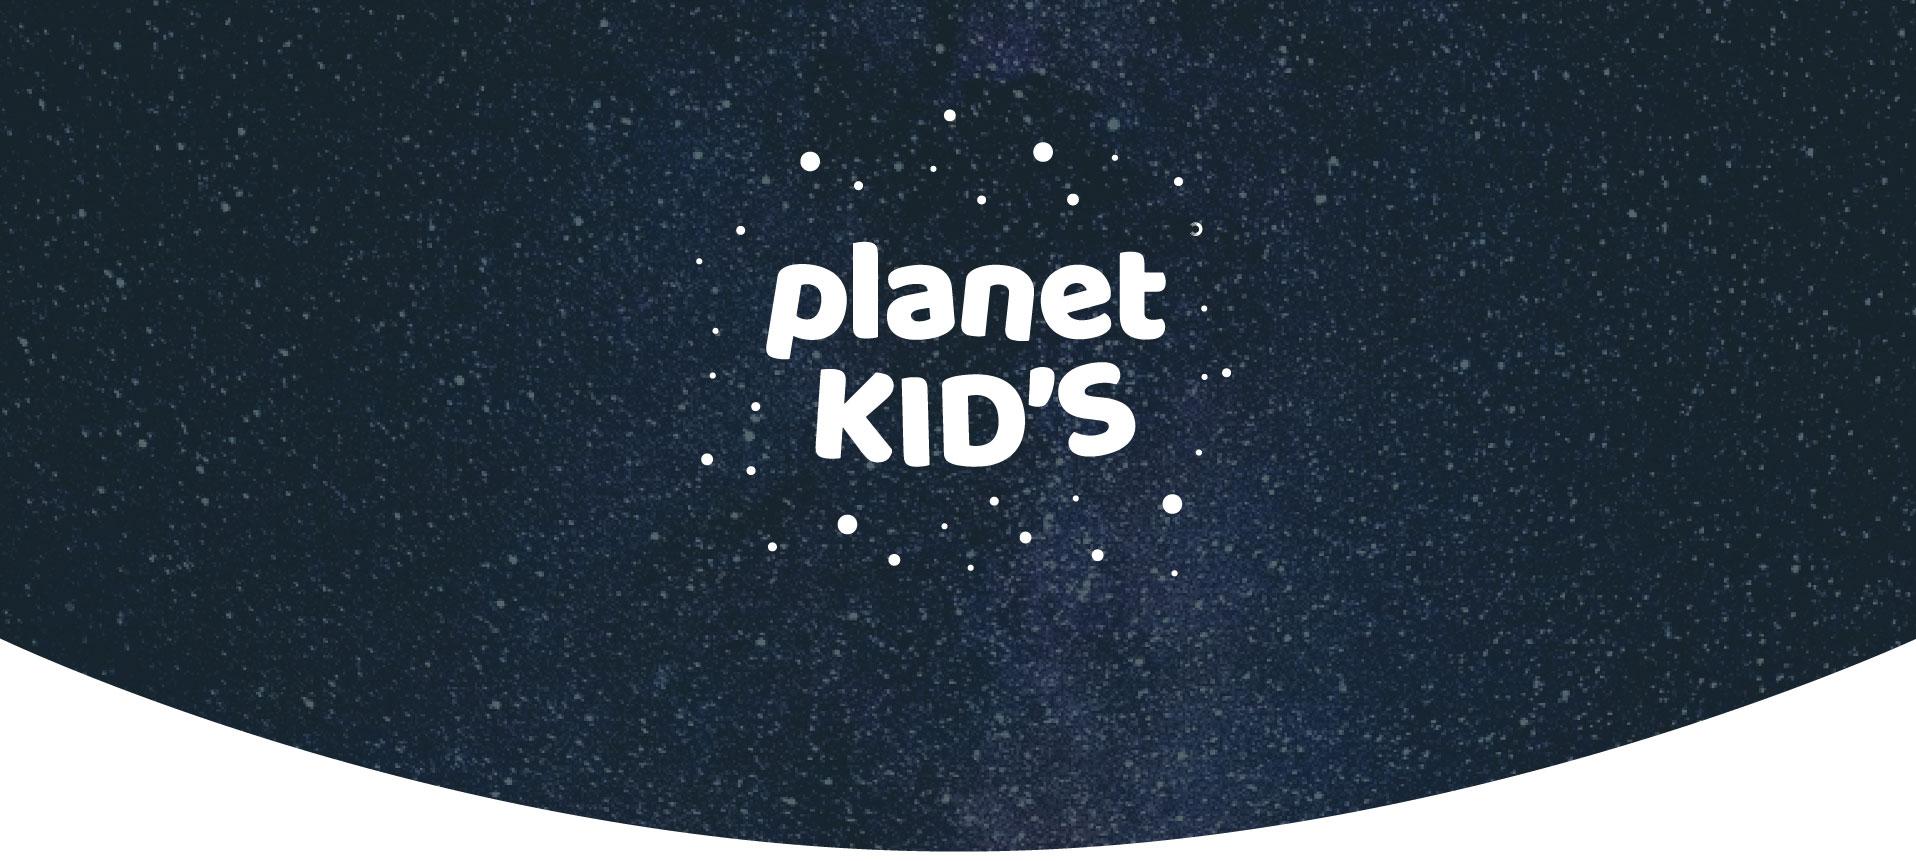 Planet kid's logo